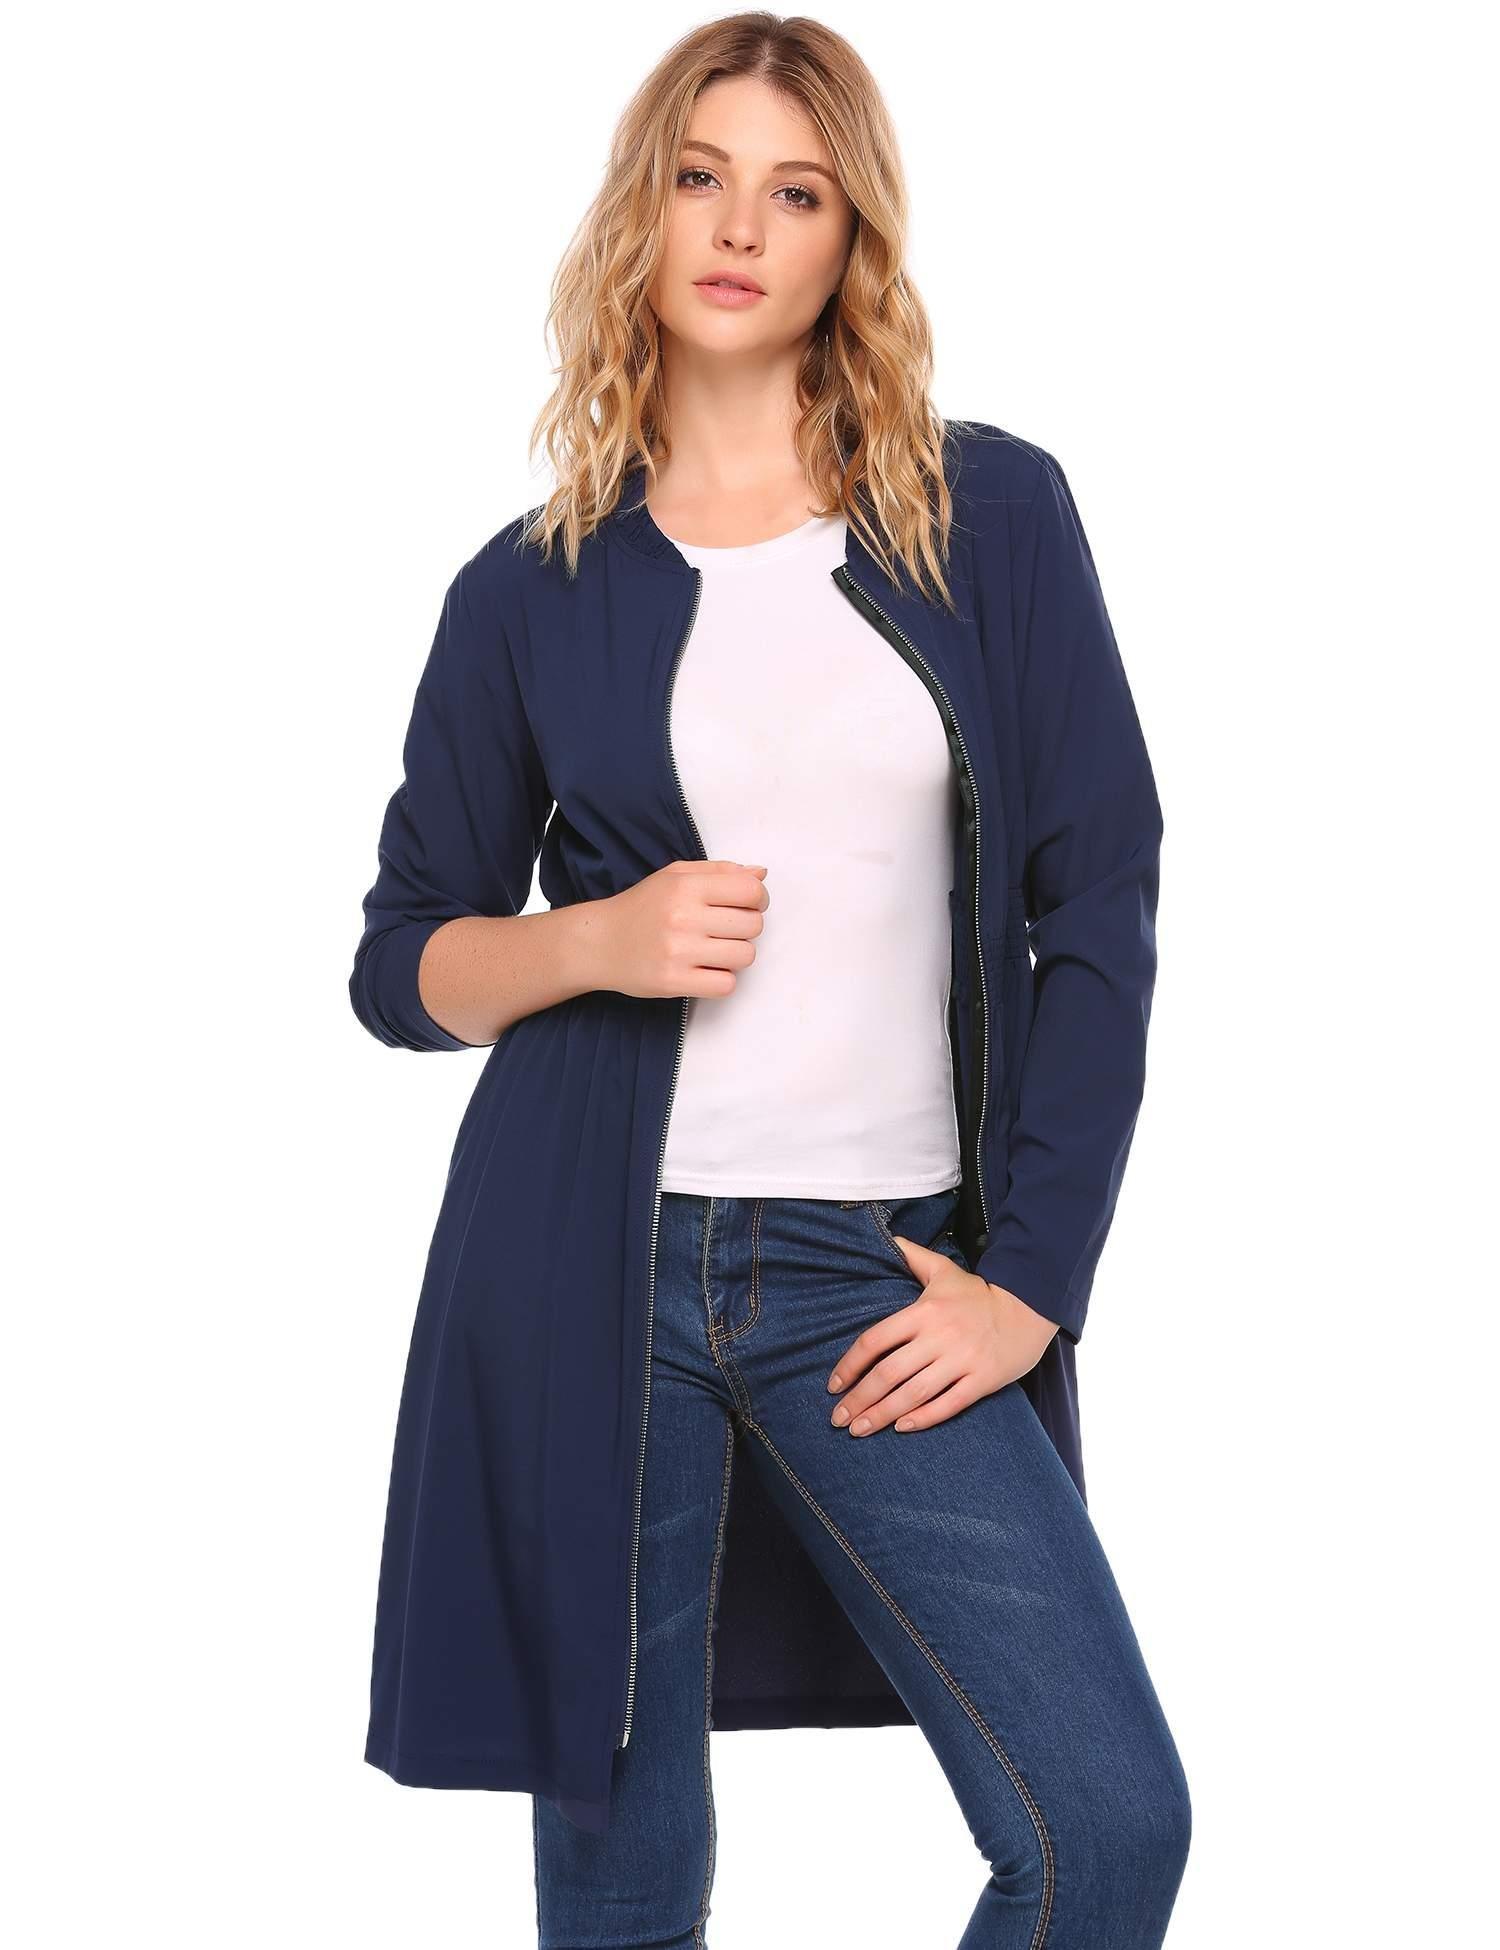 Zeagoo Women Summer Lightweight Trench Coat Long Sleeve Tunic Top Cardigan Navy Blue L